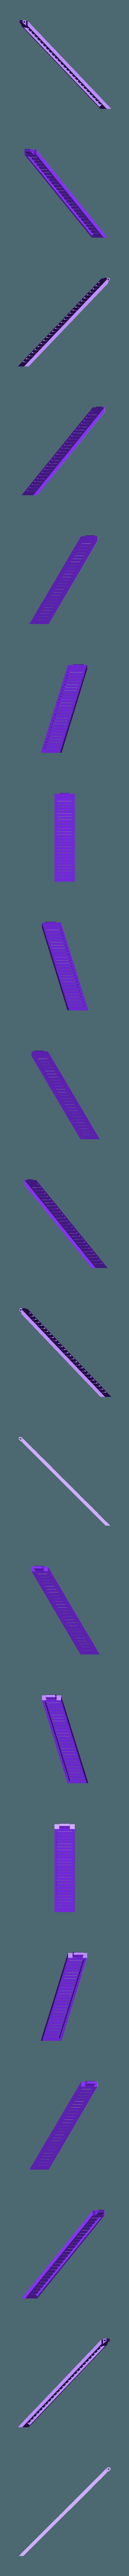 rampes scx24 rampe h100 45 deg.STL Download STL file AXIAL SCX24 mini or micro crawler Bridge 100 mm • Object to 3D print, lulu3Dbuilder